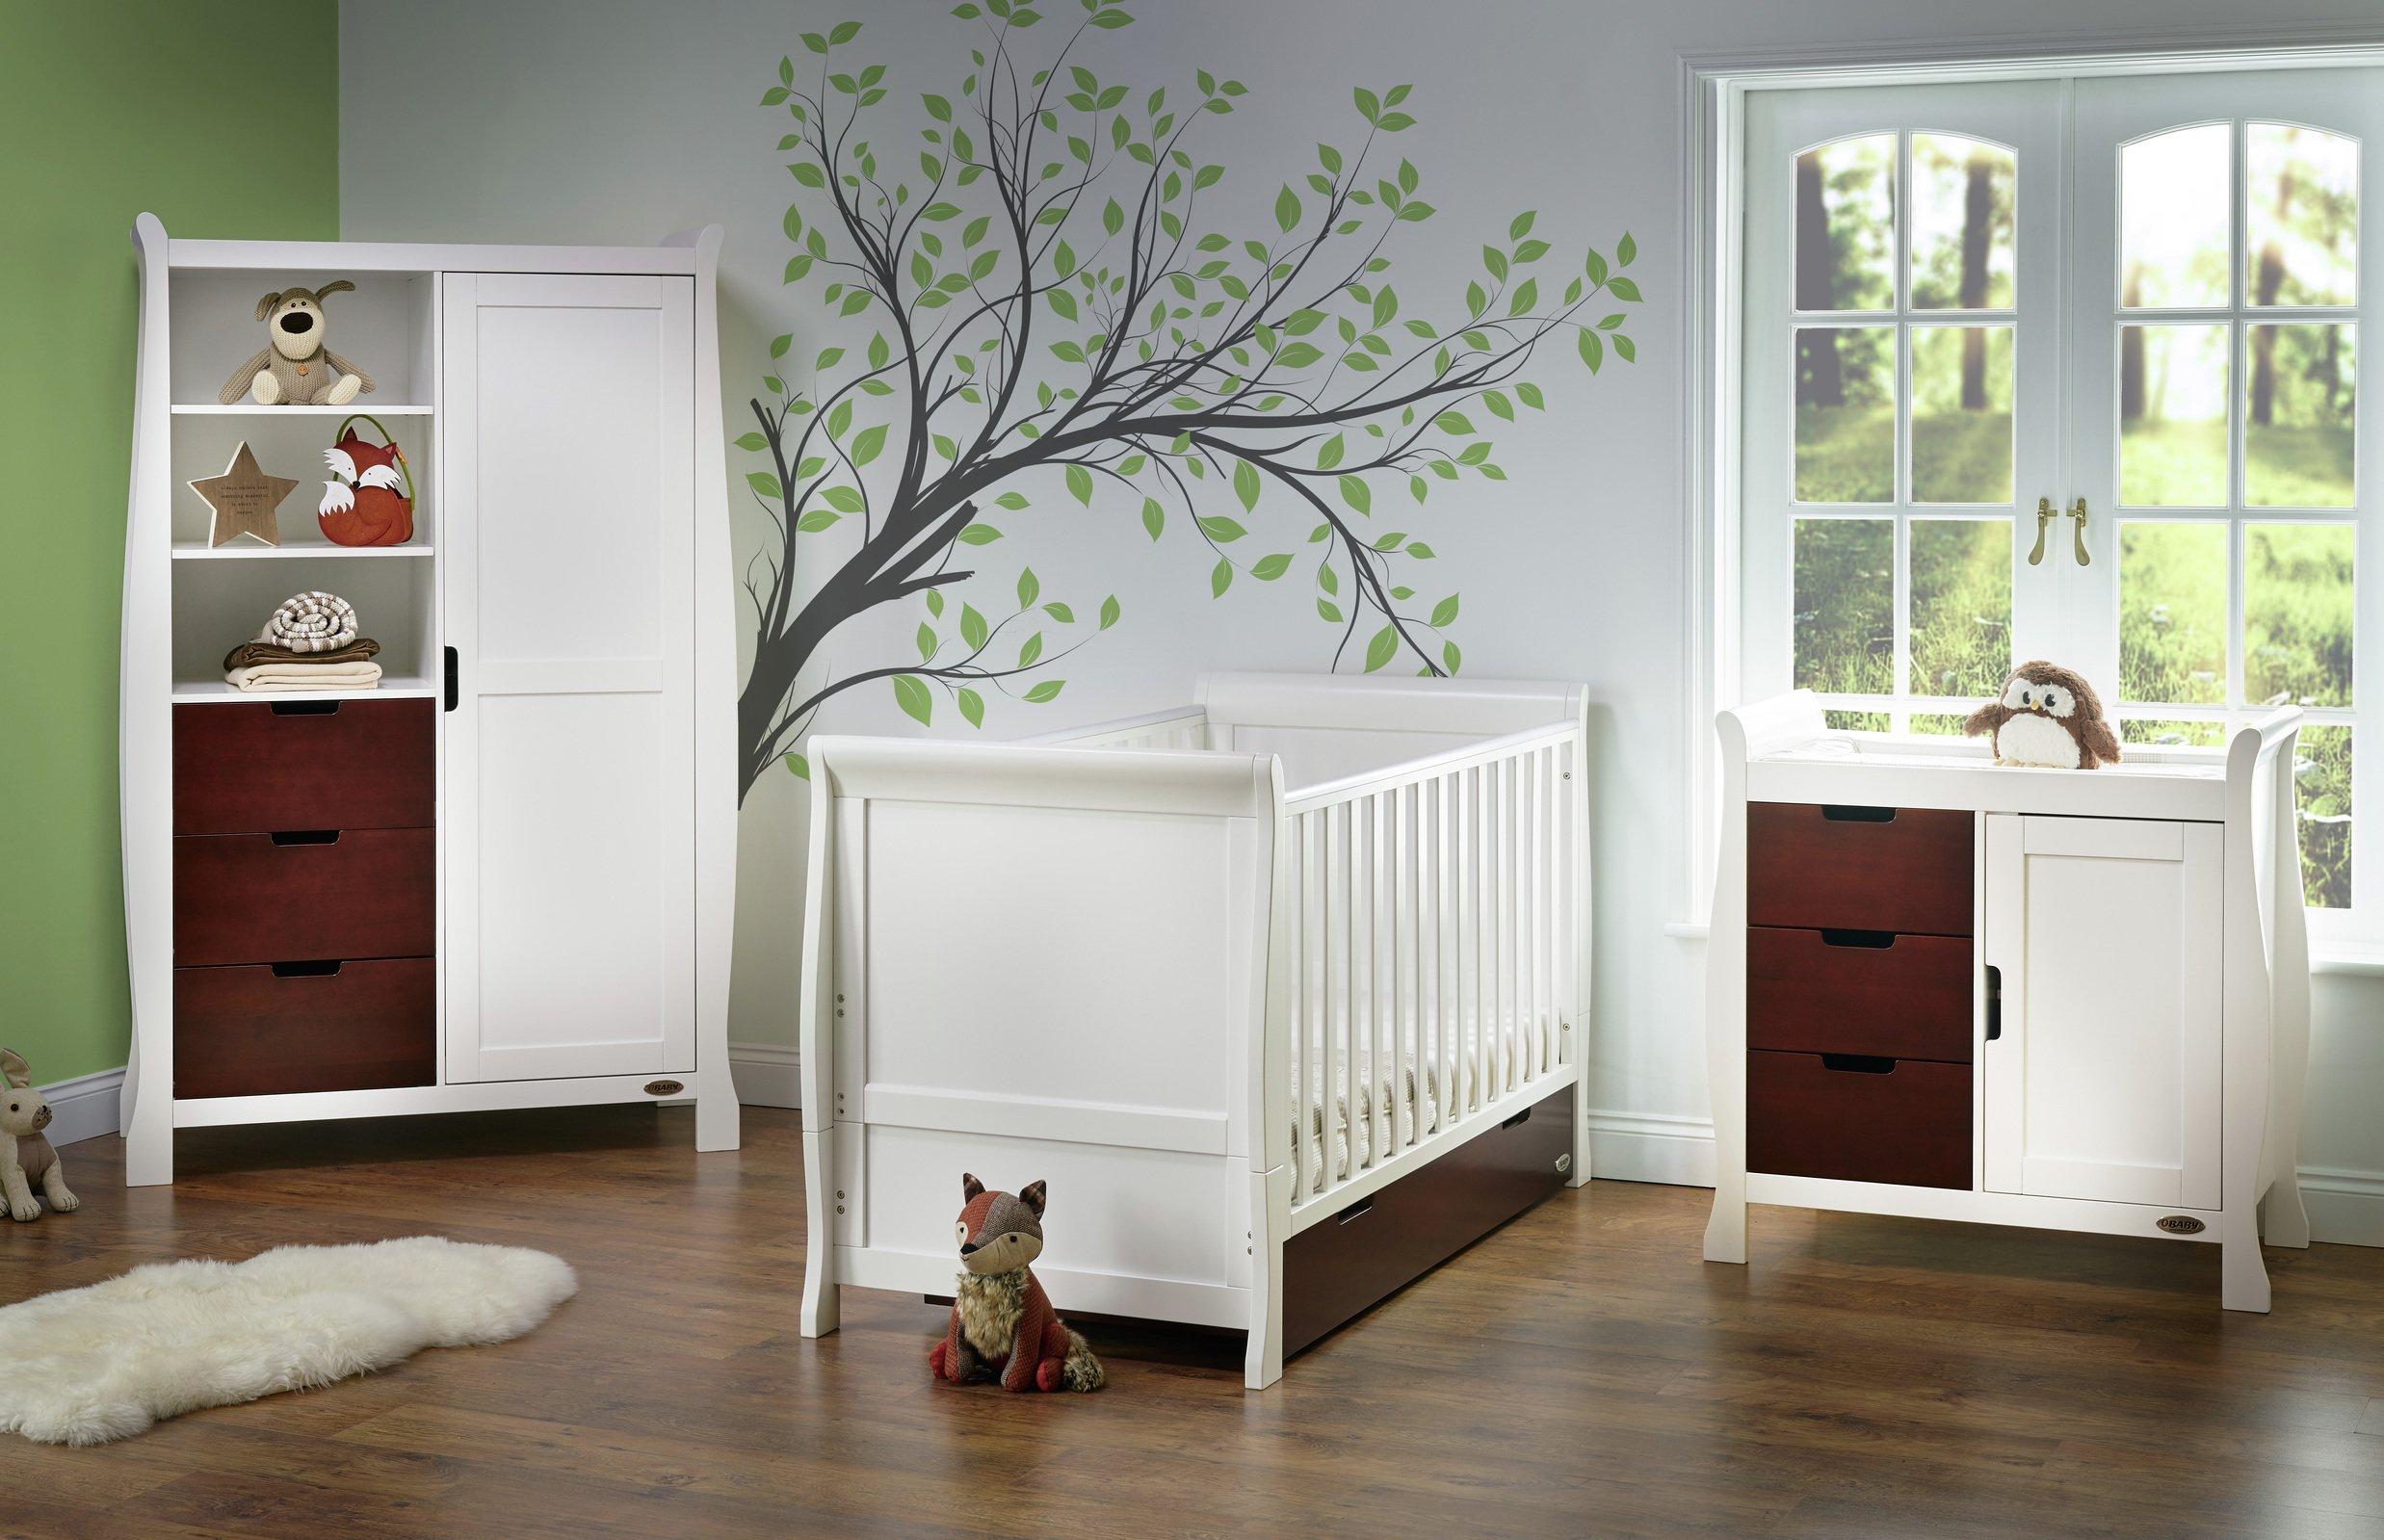 Obaby Stamford 3 Piece Room Set - White with Walnut